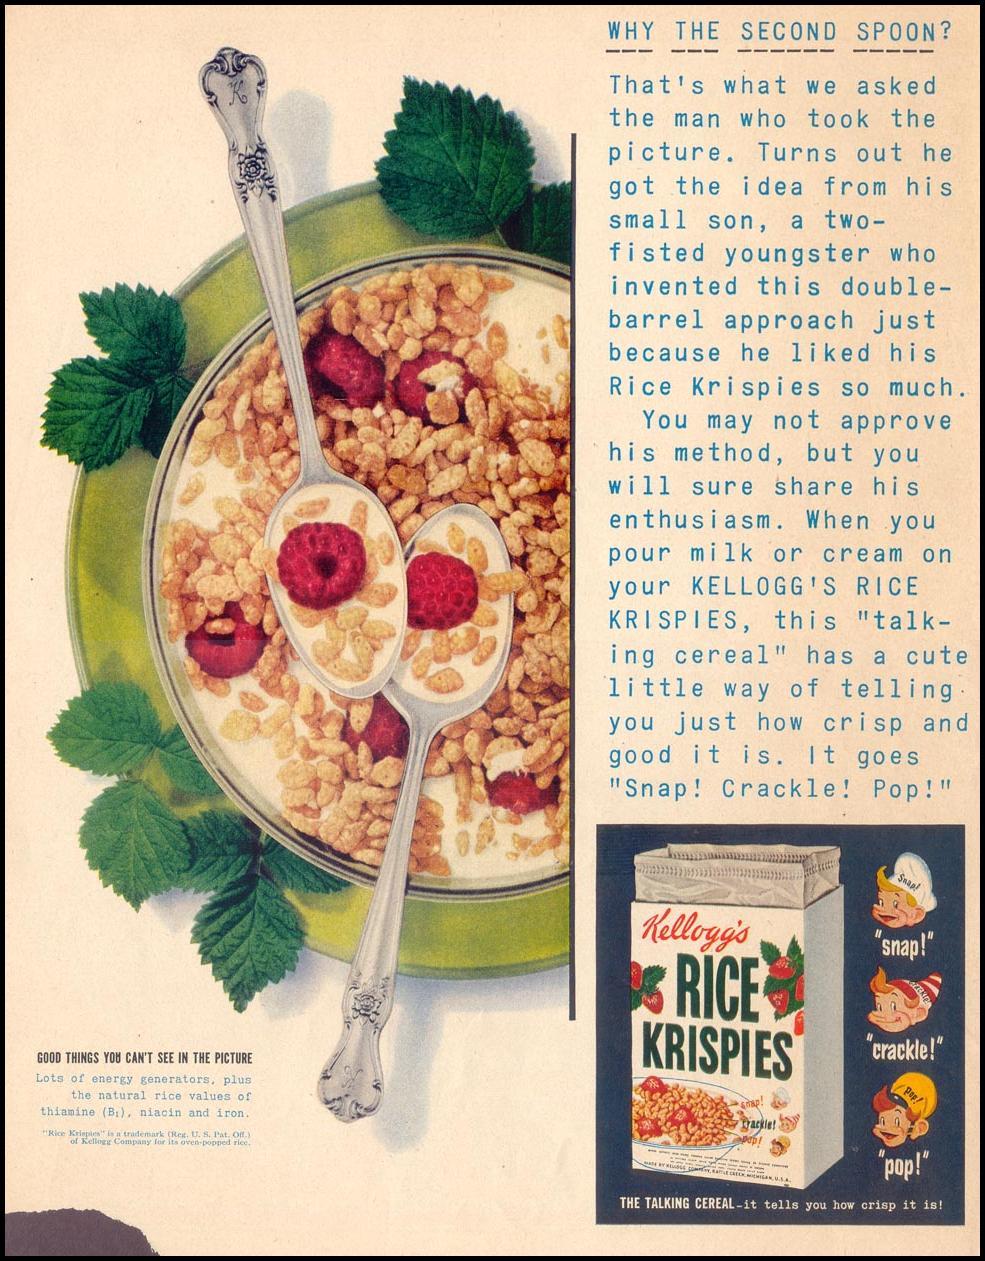 KELLOGG'S RICE KRISPIES LIFE 07/30/1951 p. 10